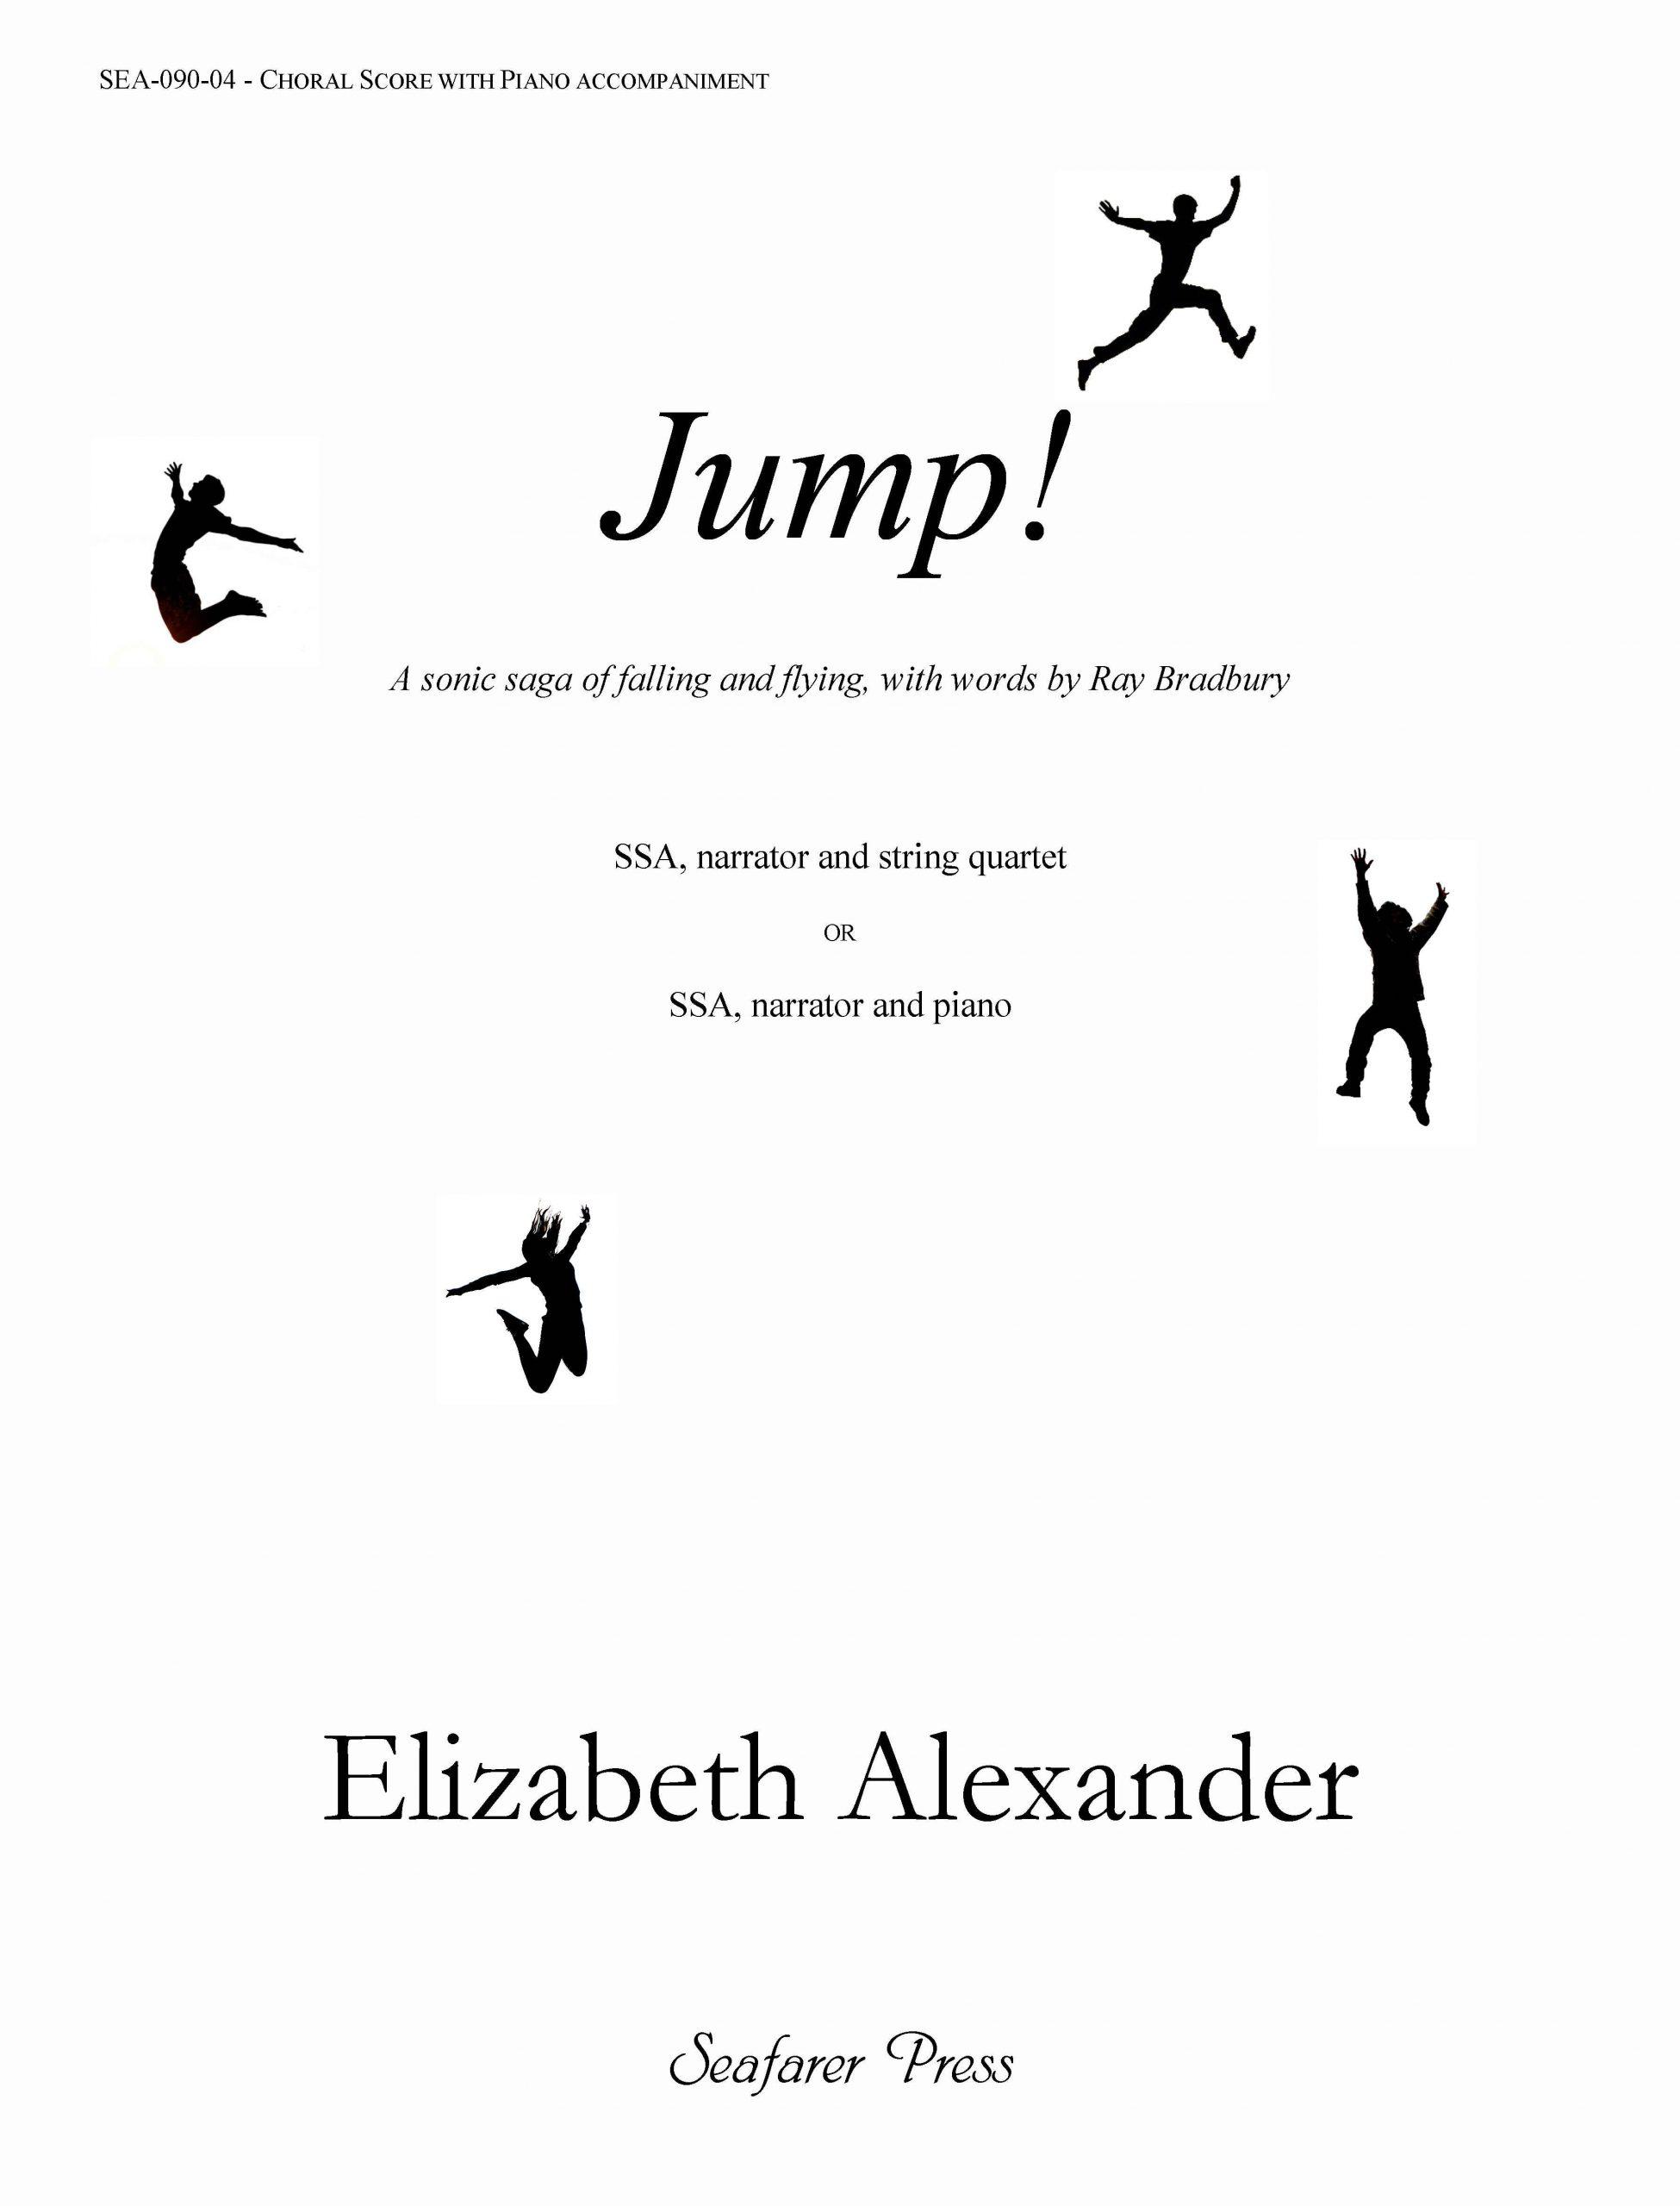 SEA-090-04 - Jump!